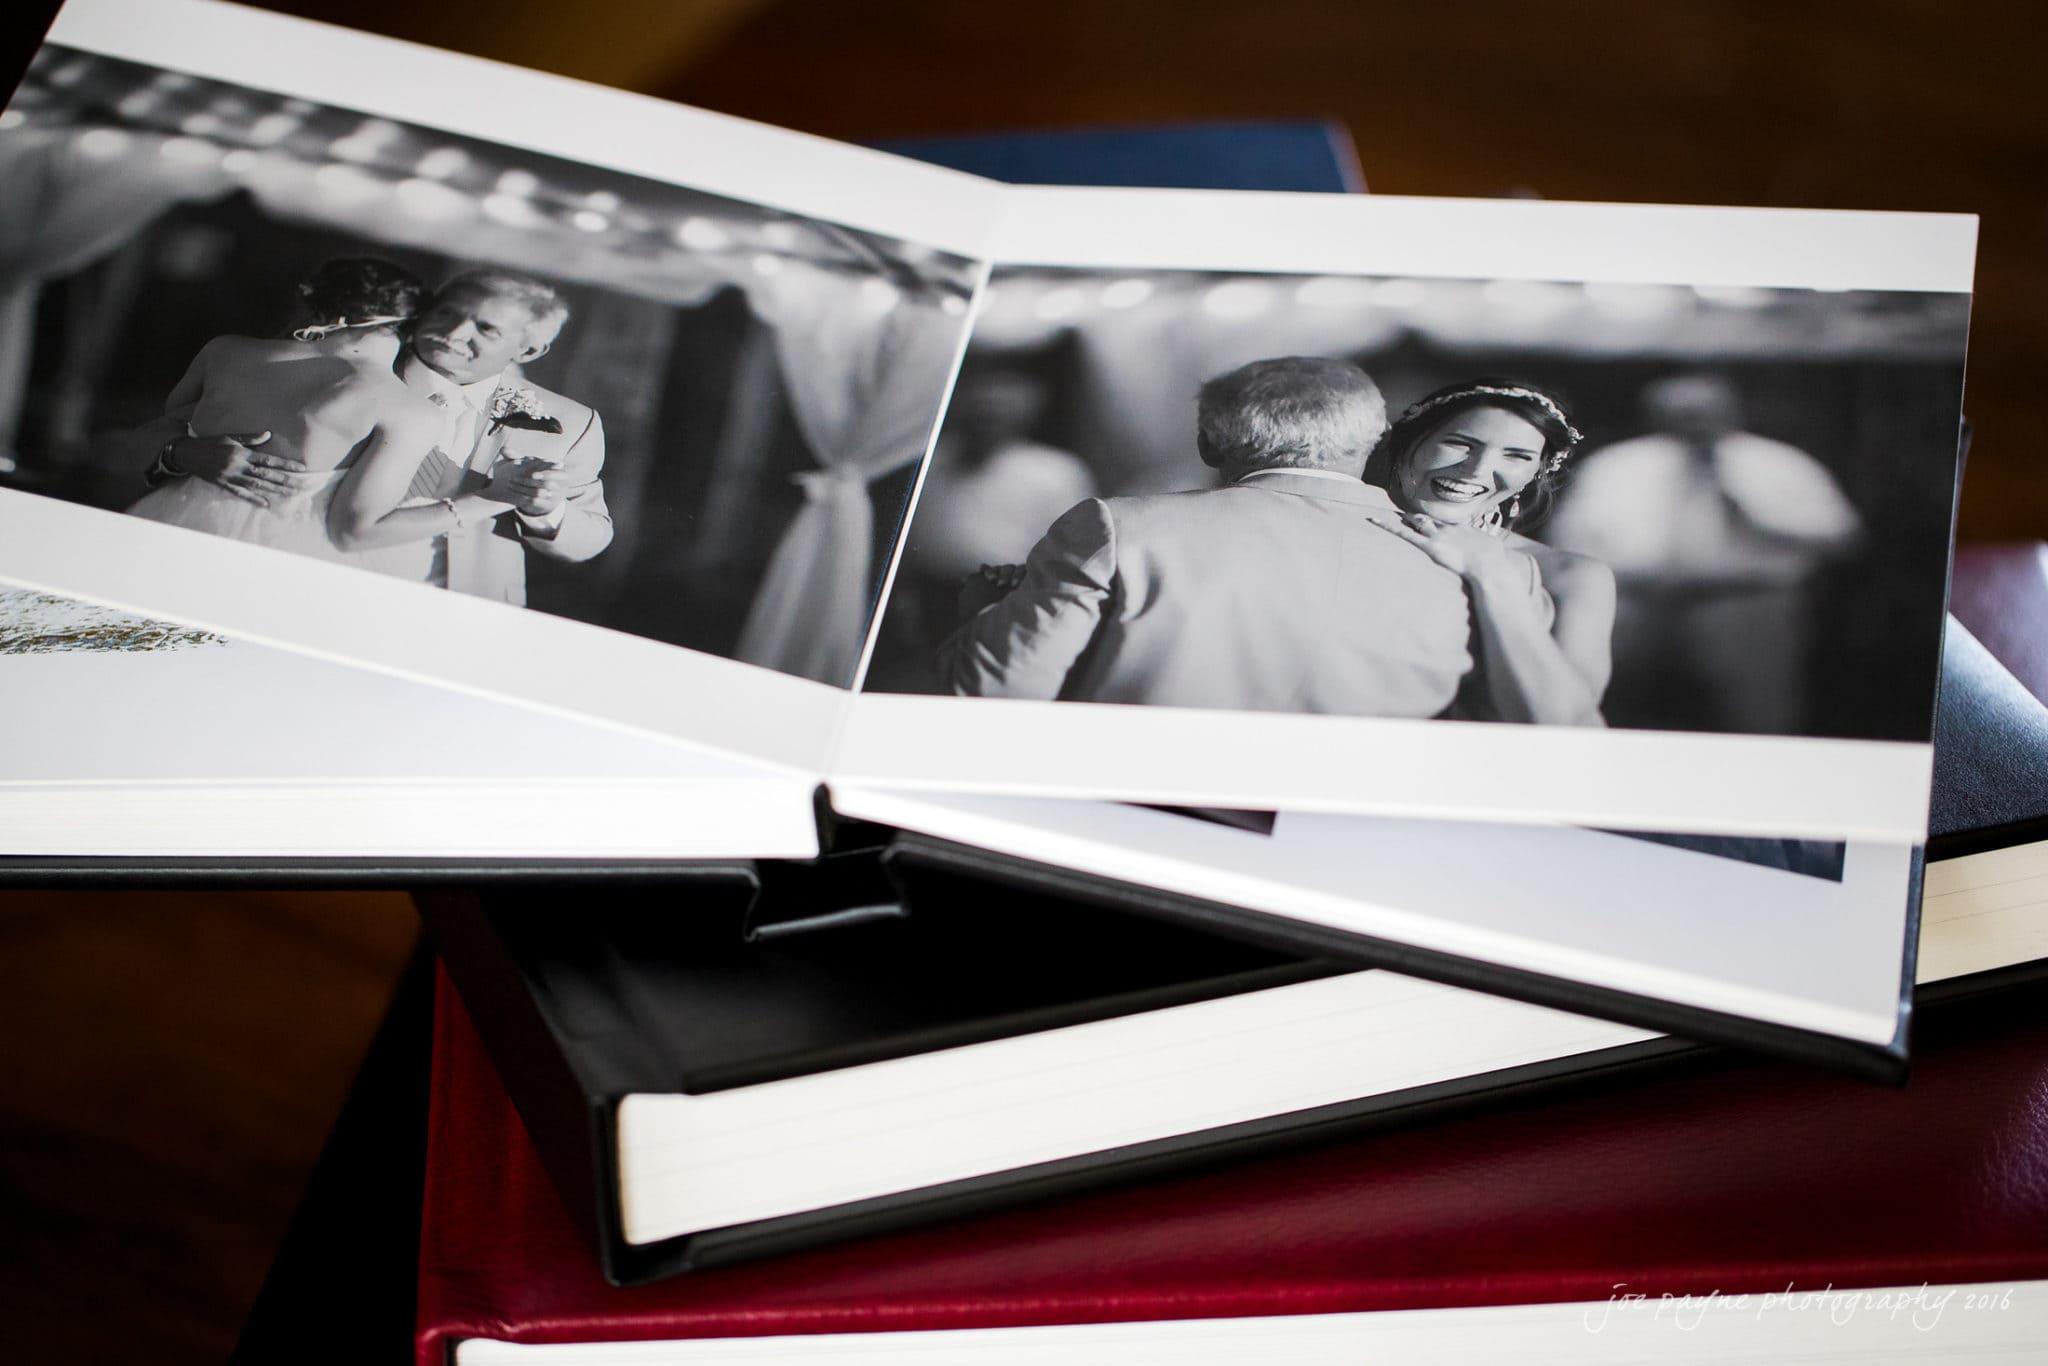 raleigh-wedding-photographer-joe-payne-photography-albums-7